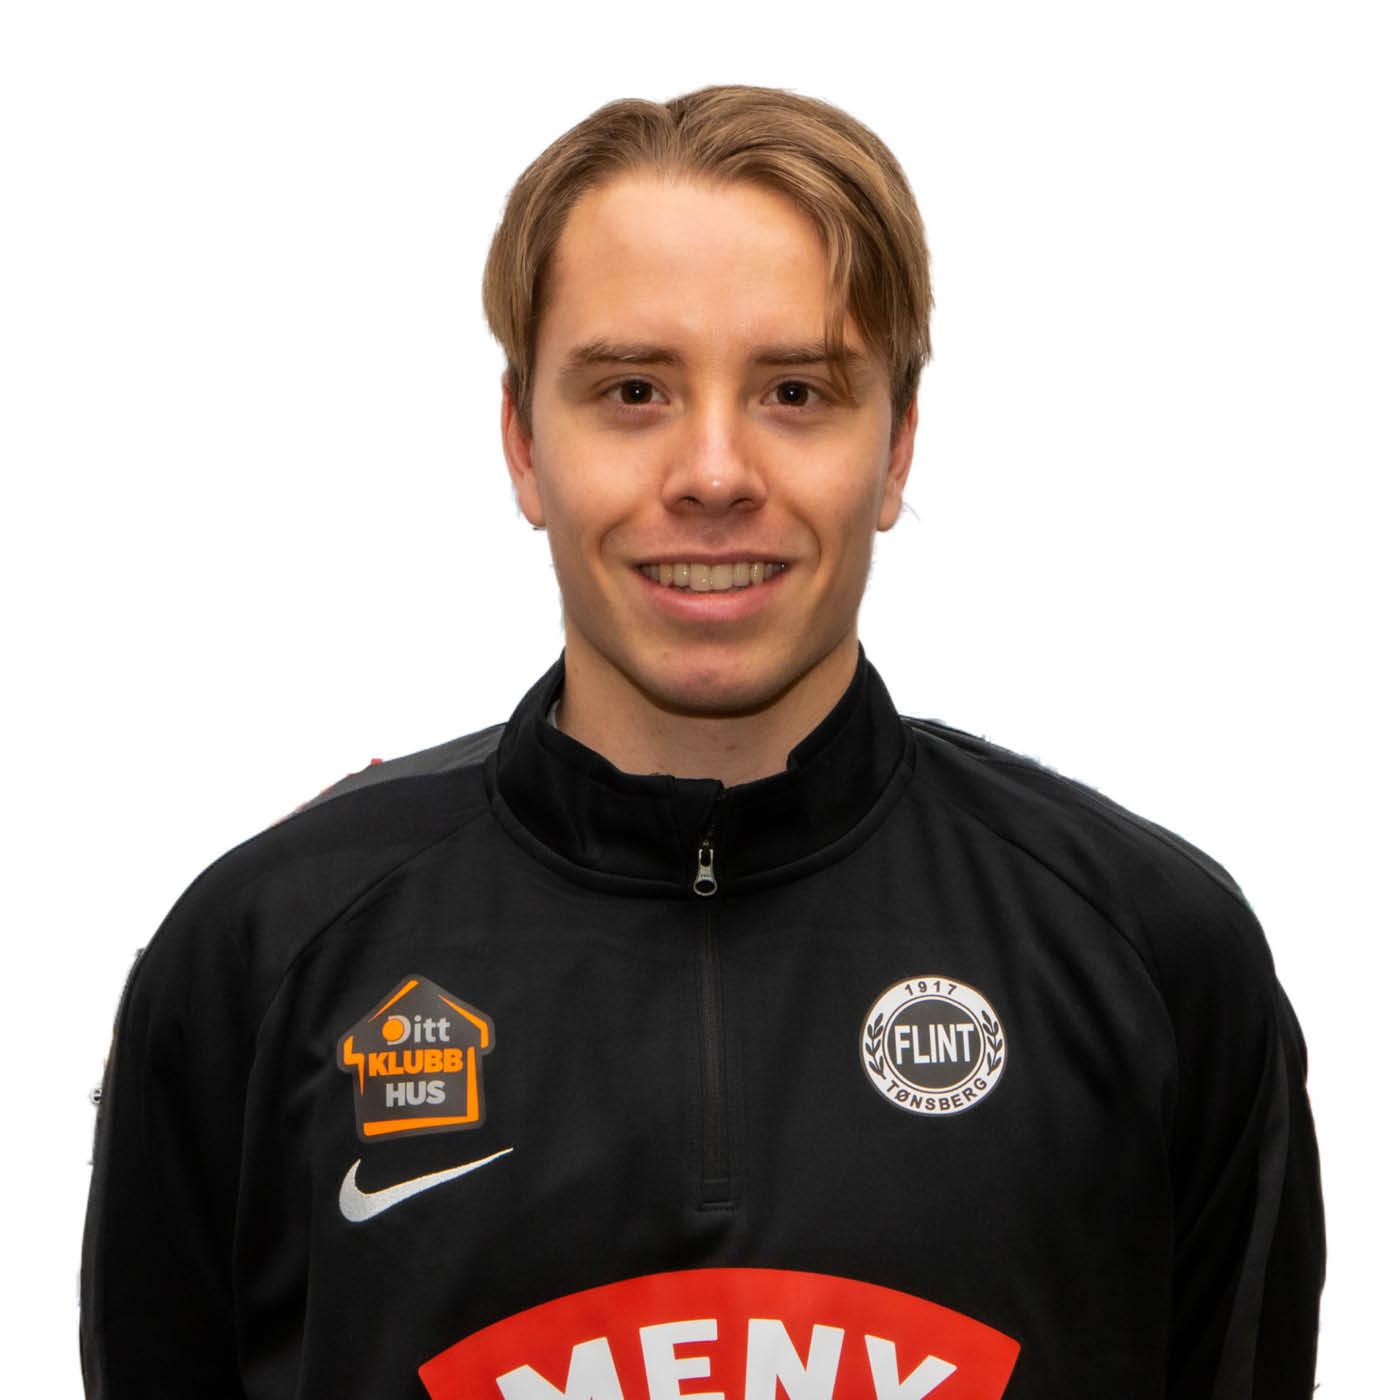 https://www.flintfotball.no/wp-content/uploads/2021/02/Jonas-Johansen-kvadratisk-nettside.jpg